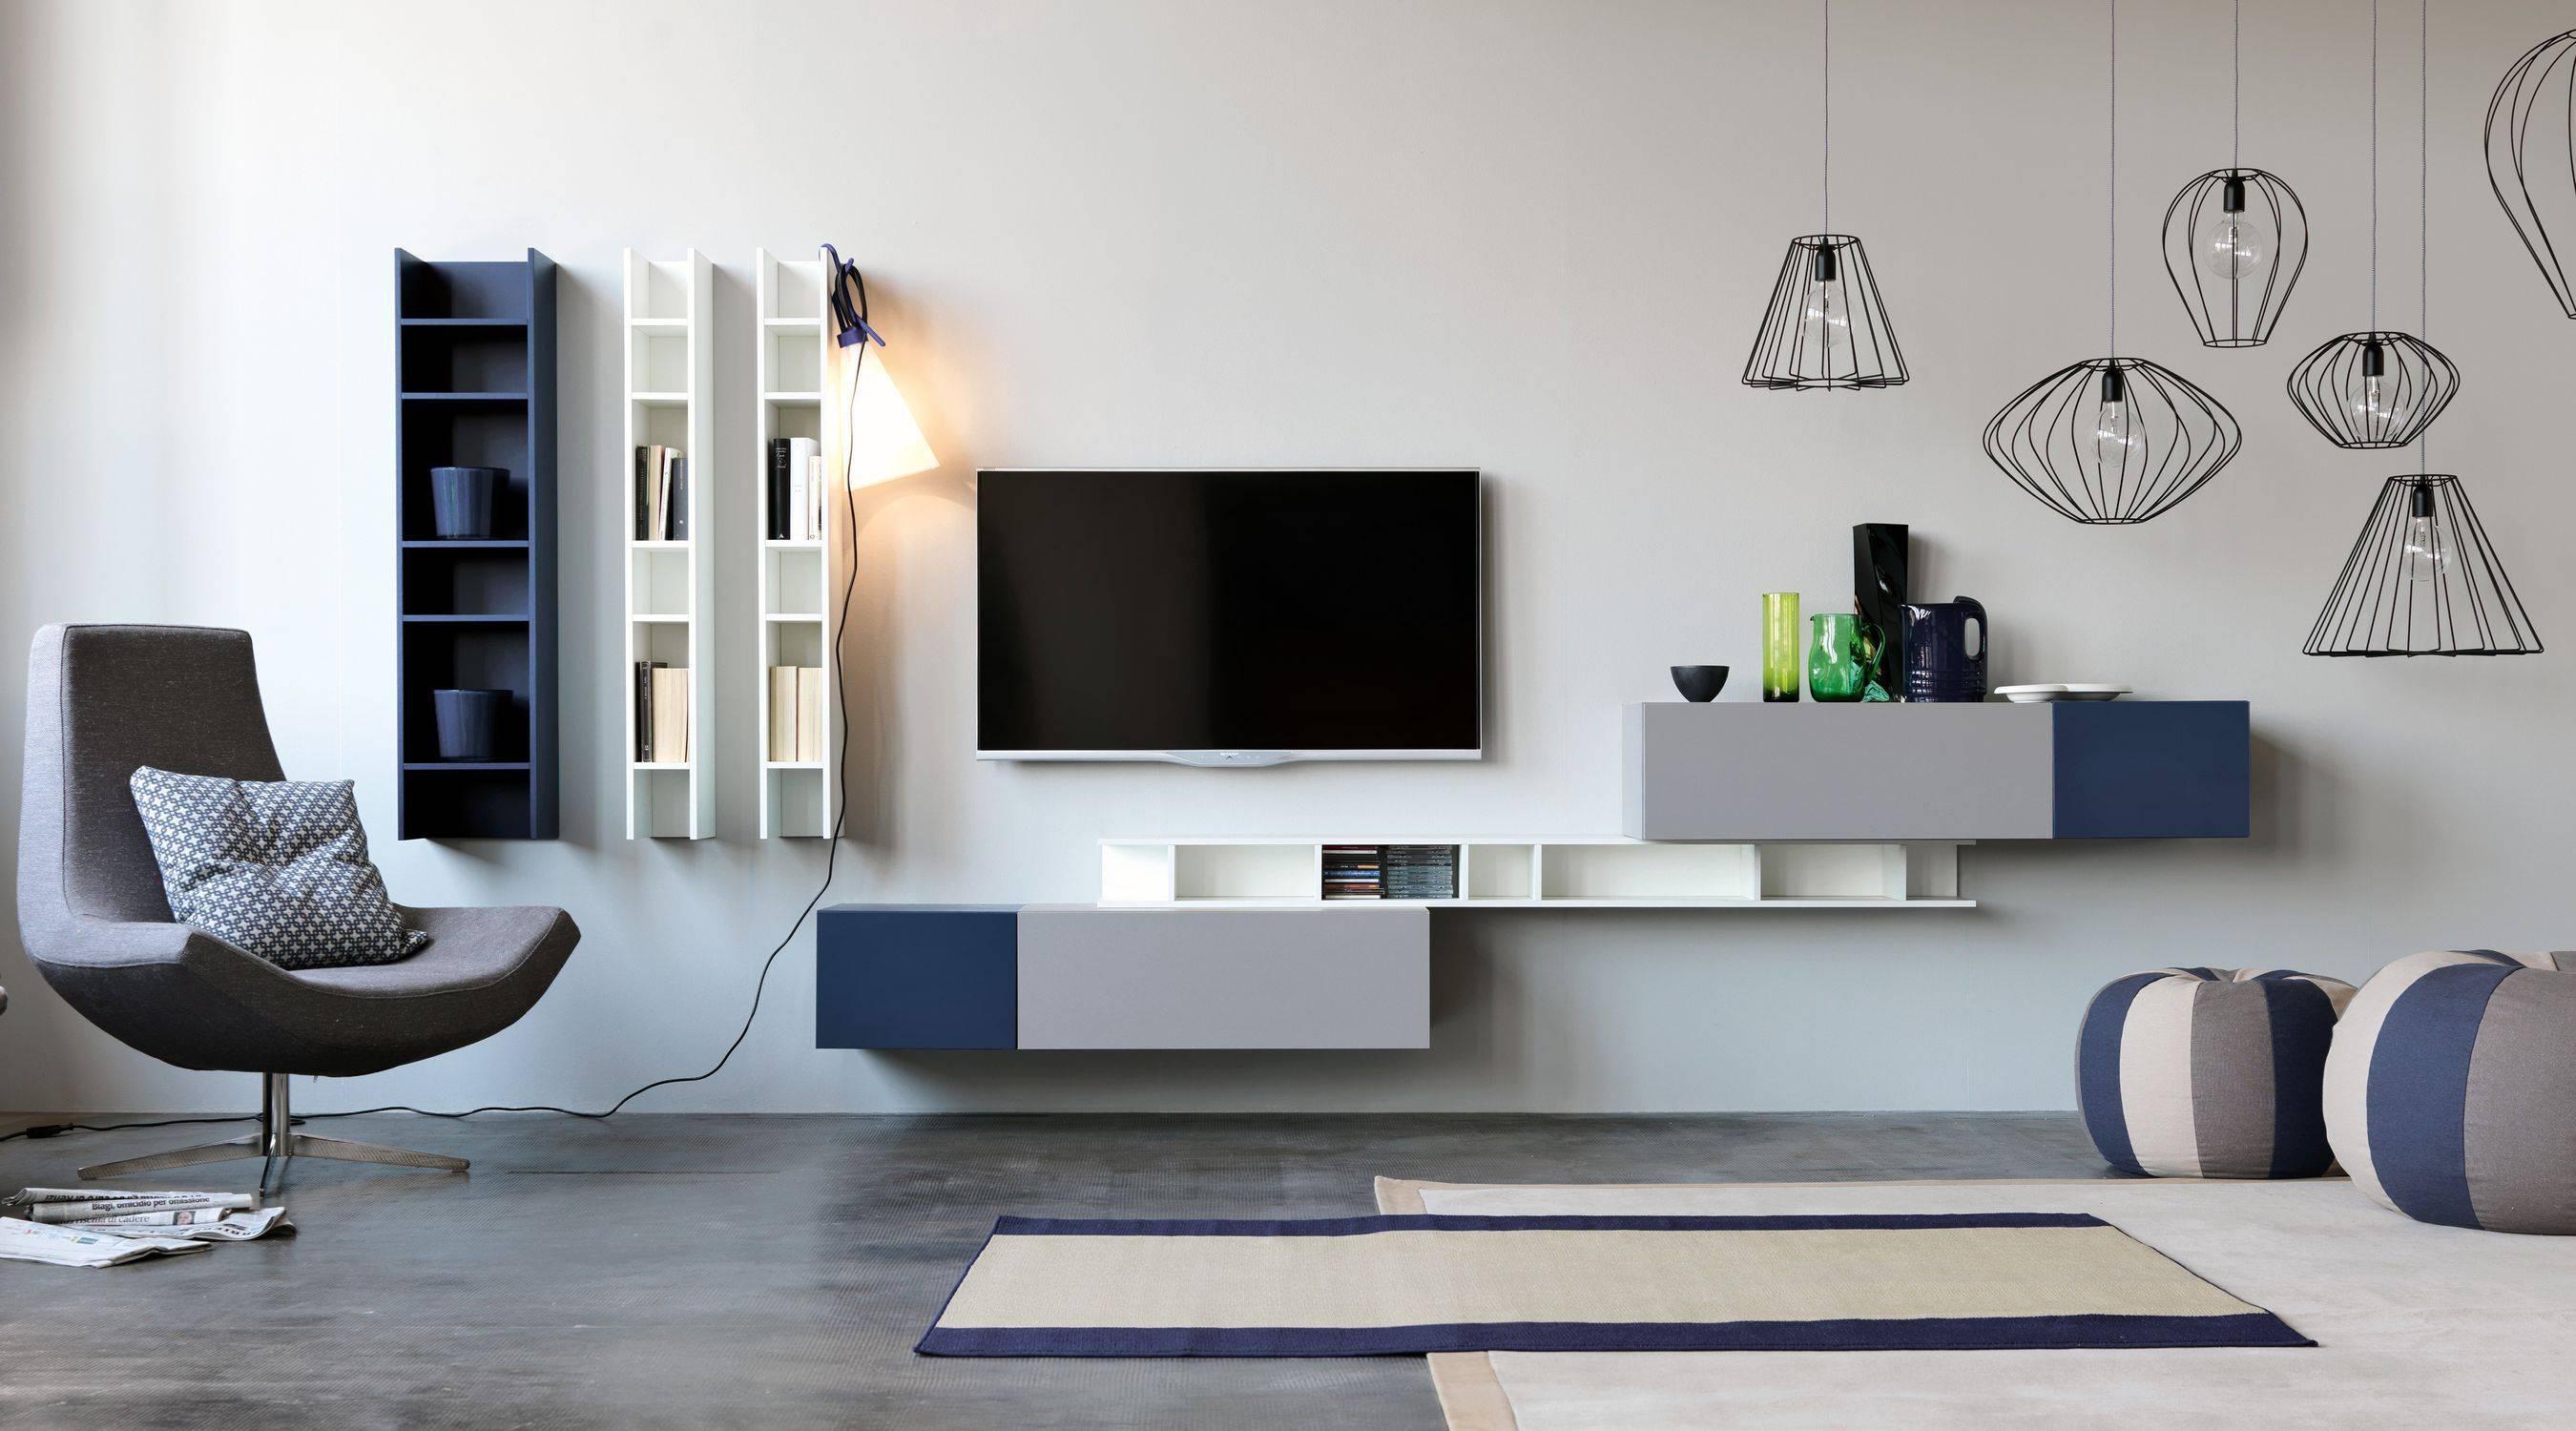 Contemporary Tv Wall Unit / Modular – Citylife 14 – Doimo Cityline Regarding Contemporary Tv Wall Units (View 10 of 15)